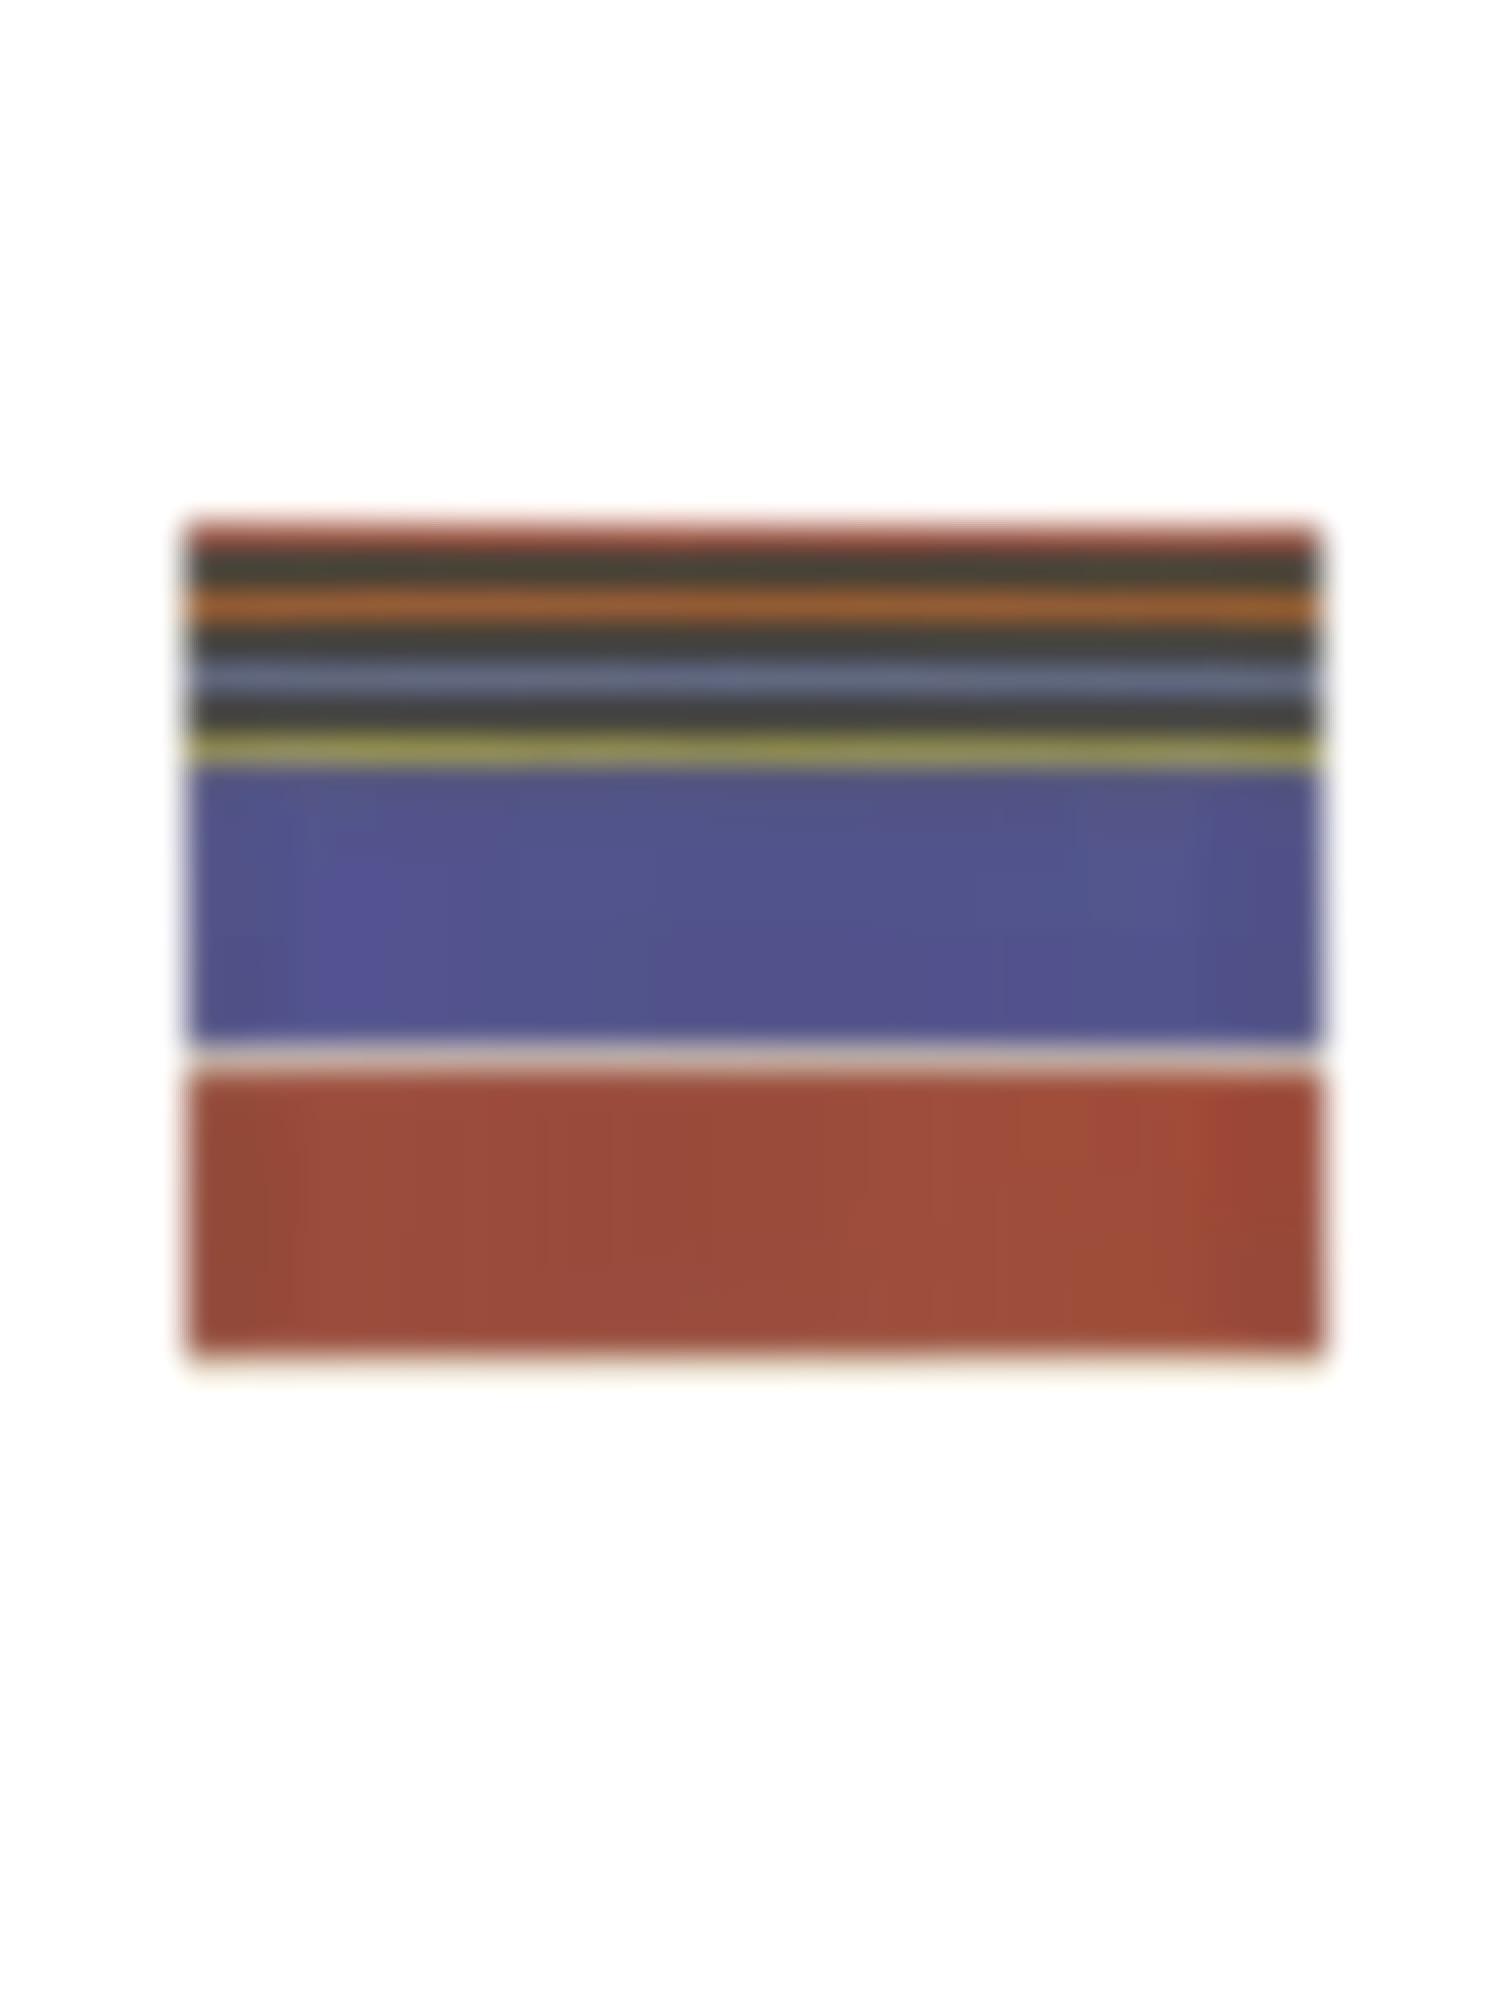 Kenneth Noland-Silent Adios I; Rainbow's Blanket [Two Works]-1980